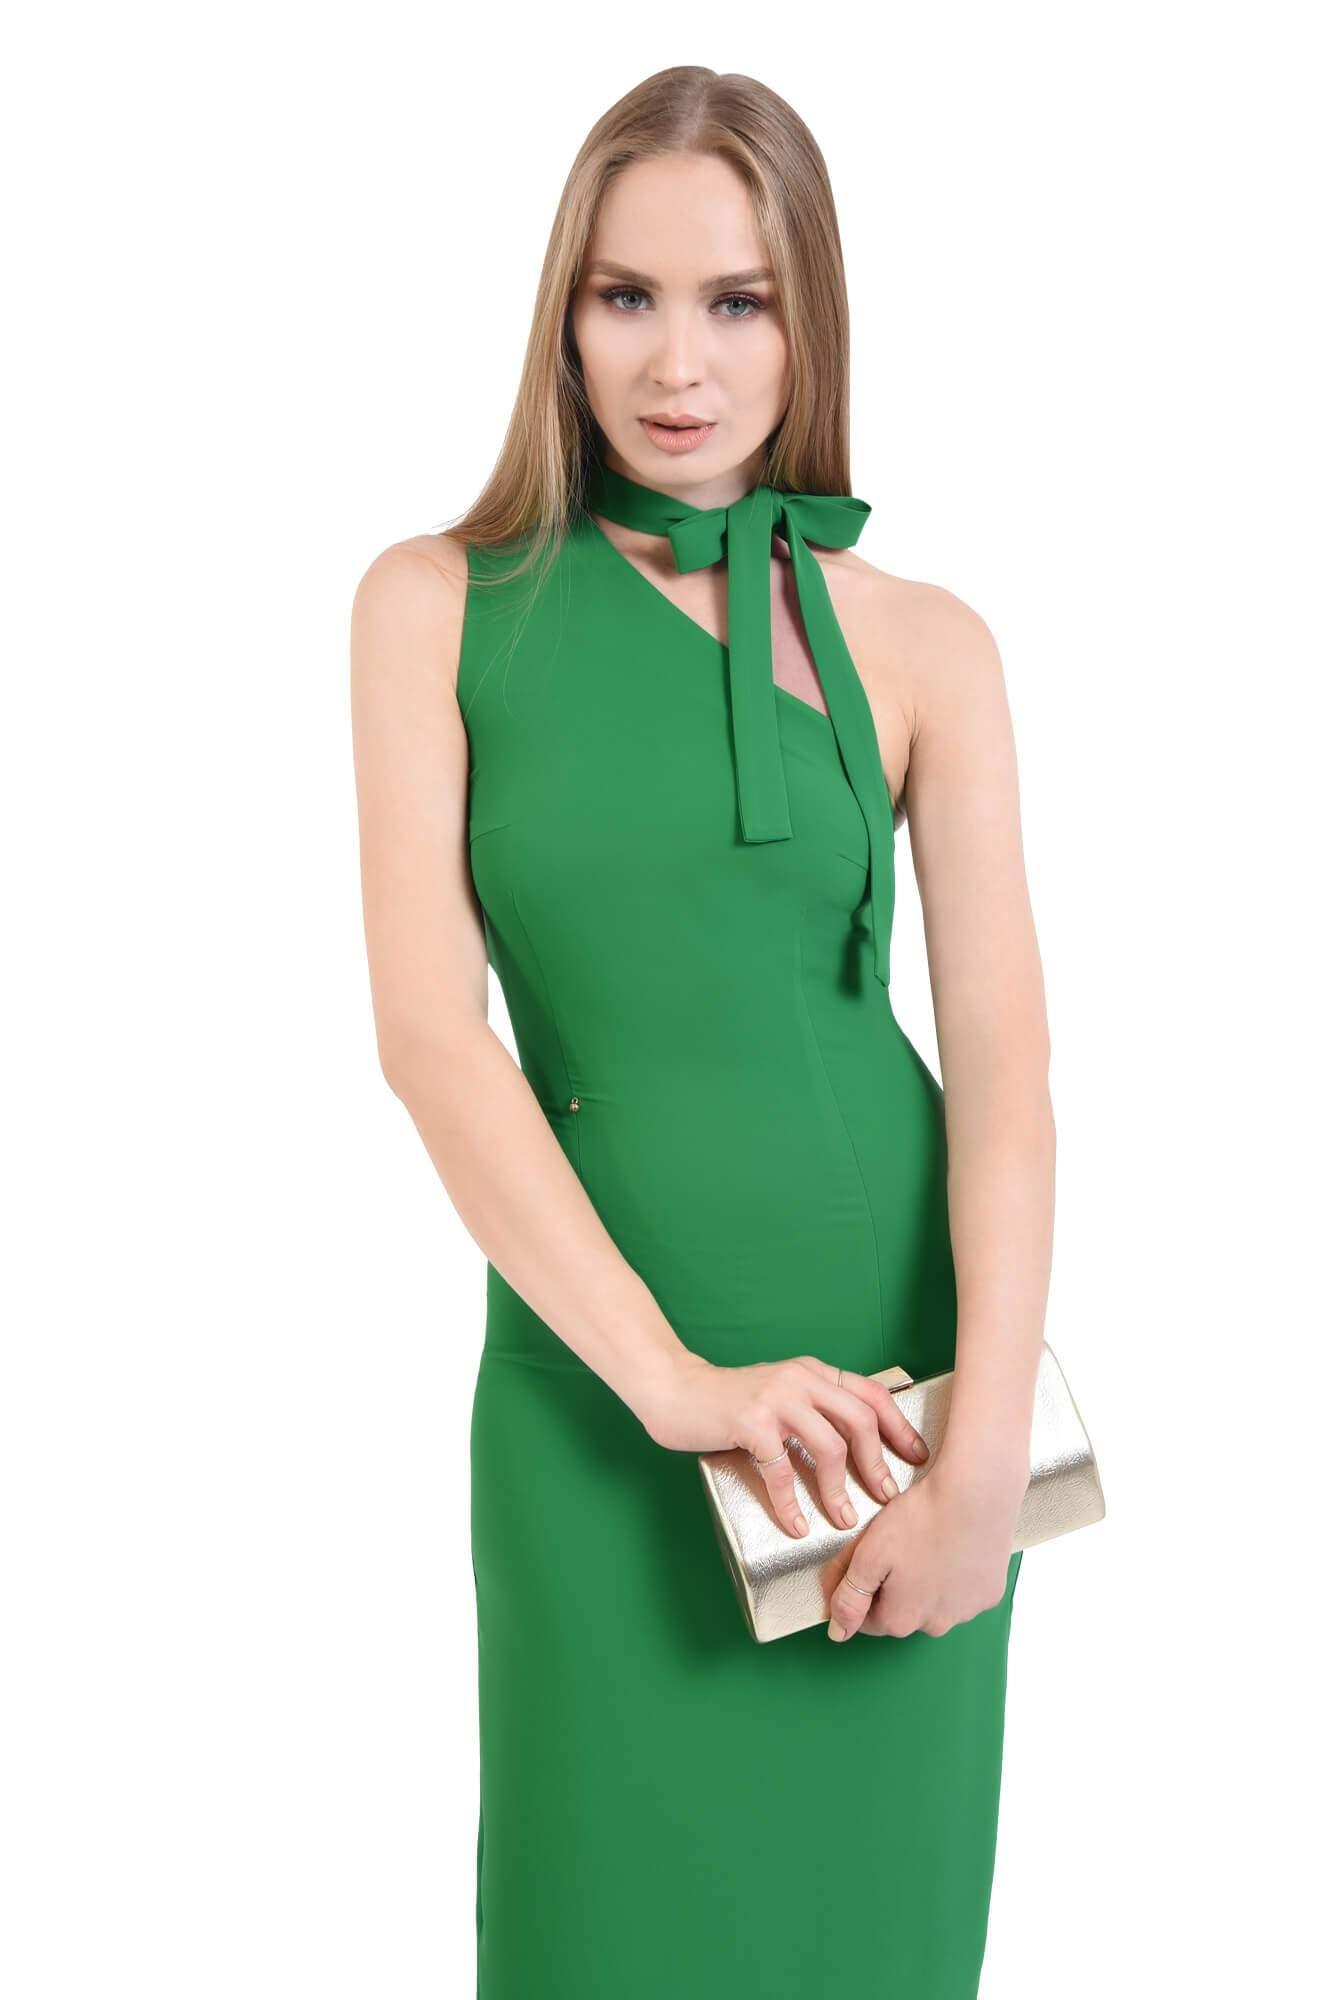 Rochie verde, eleganta, cu umar gol